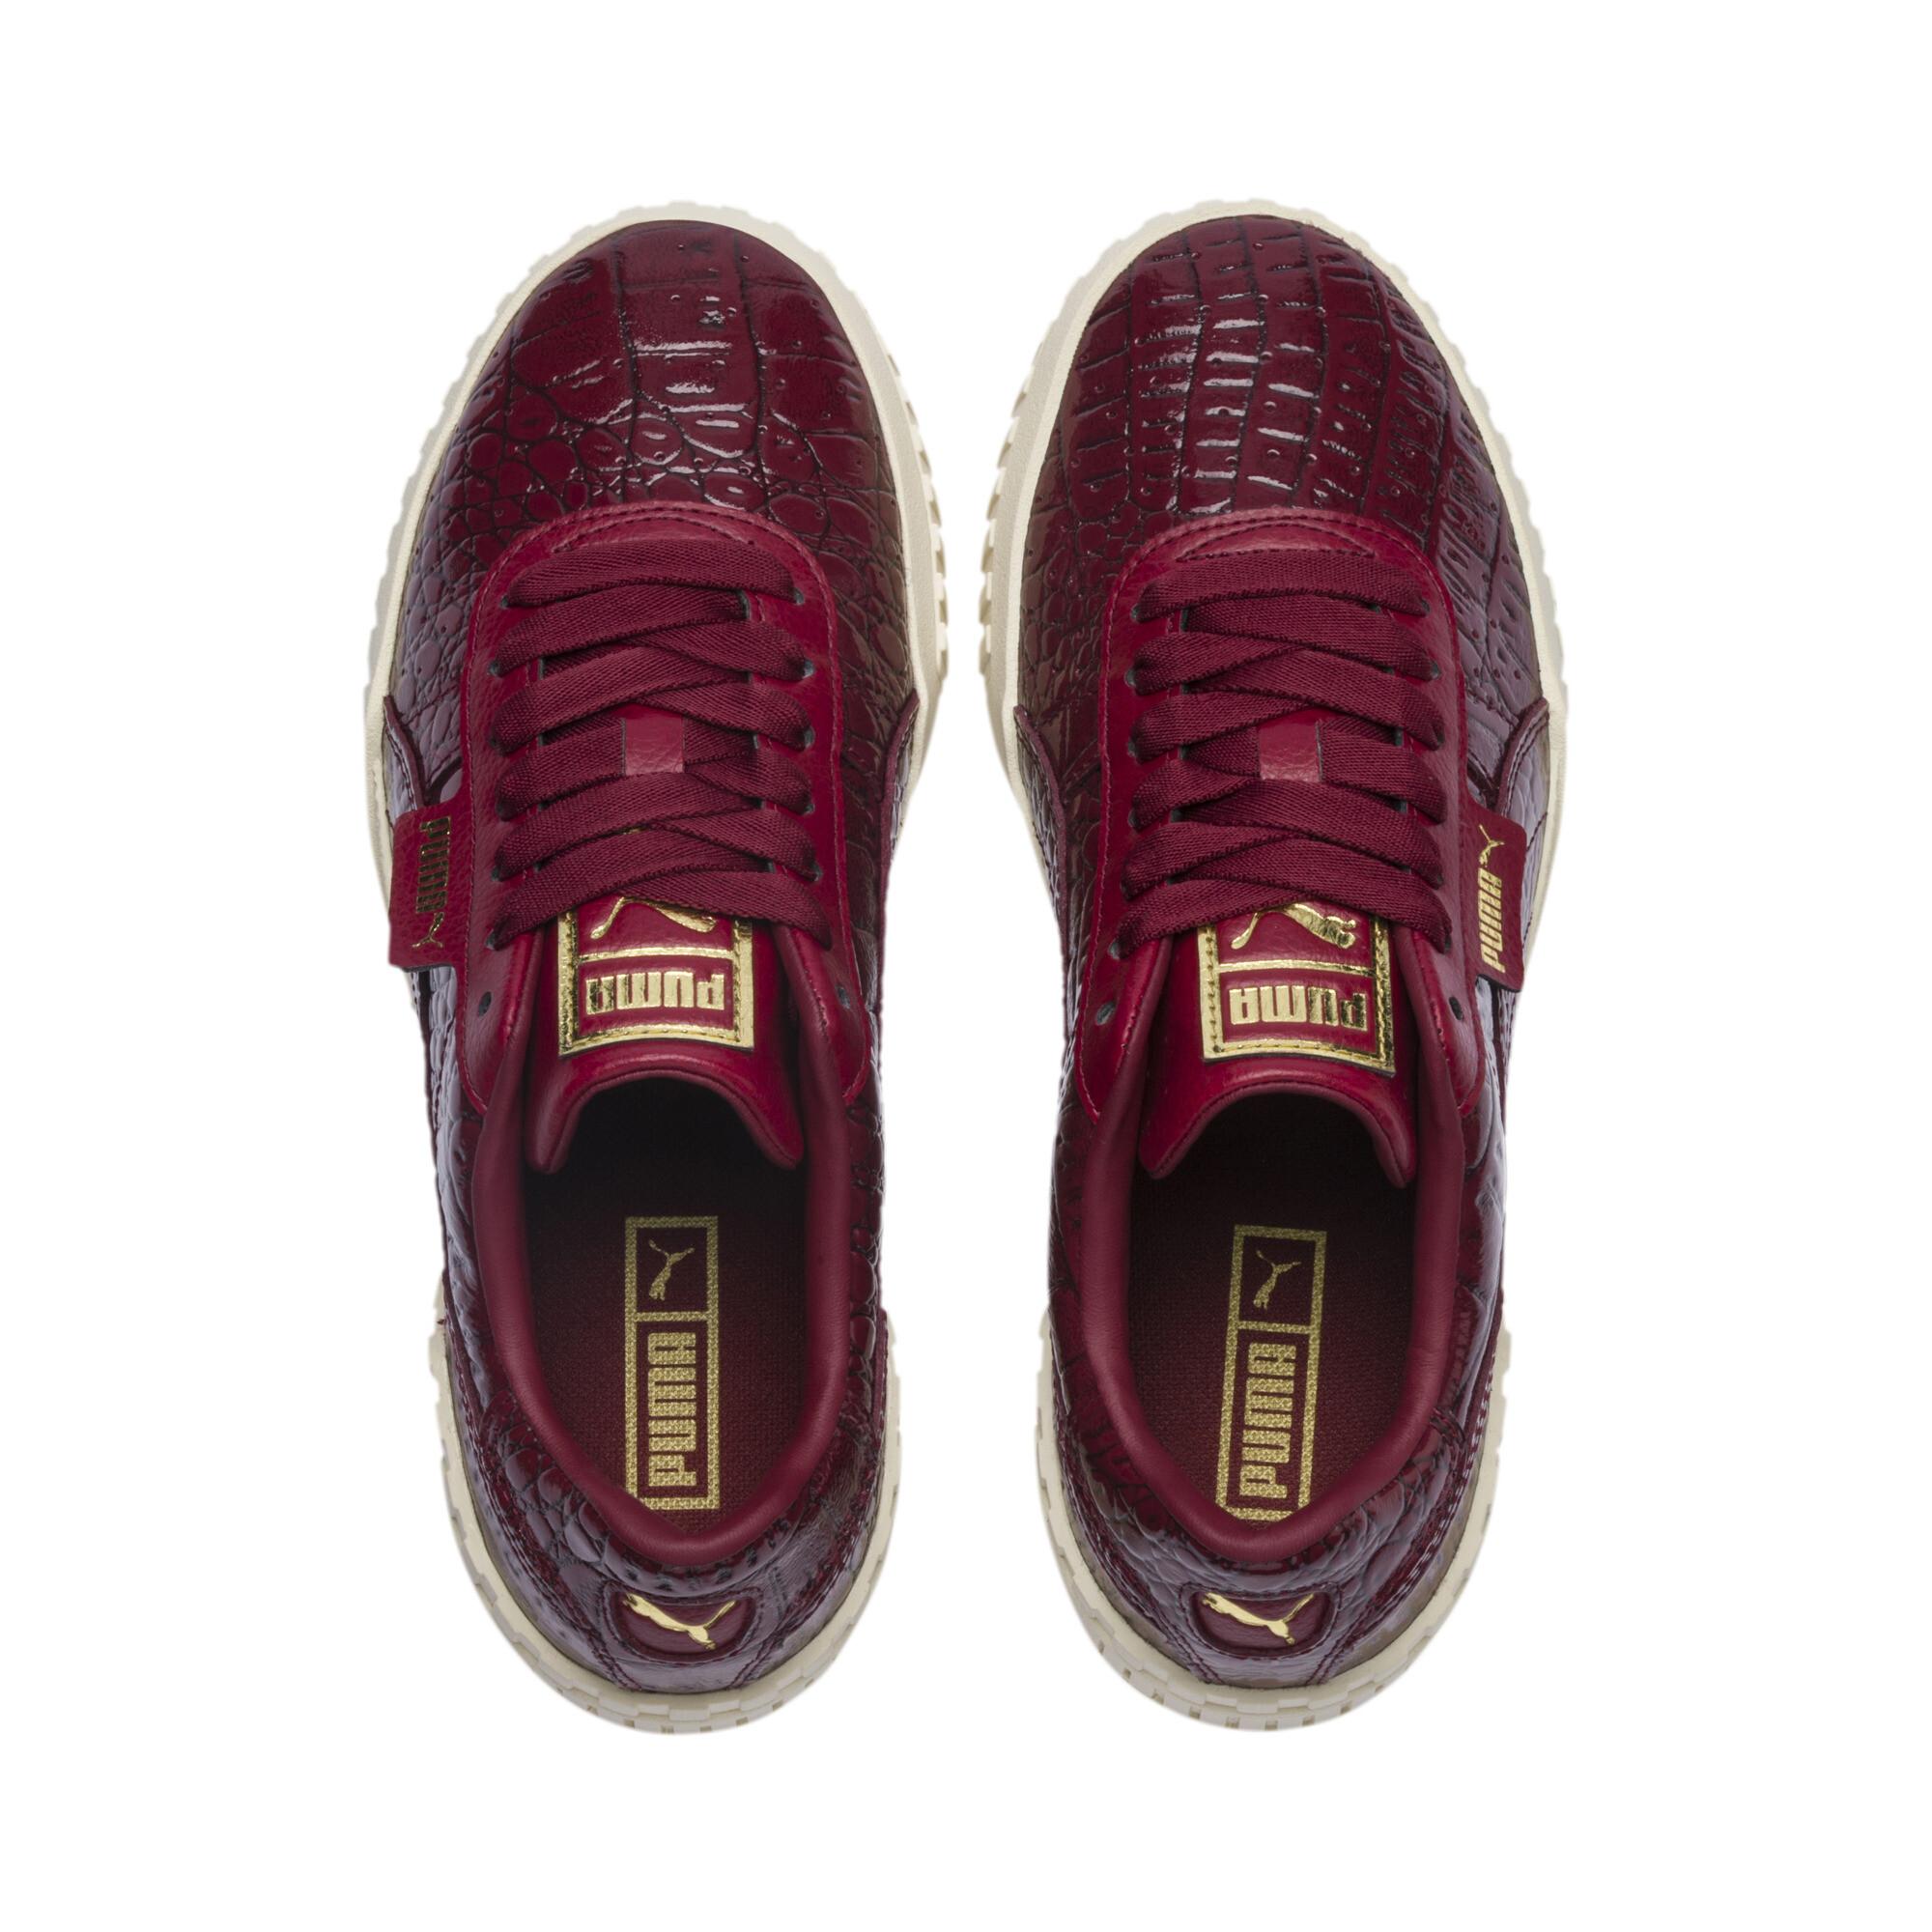 Image Puma Cali Croc Women's Sneakers #7